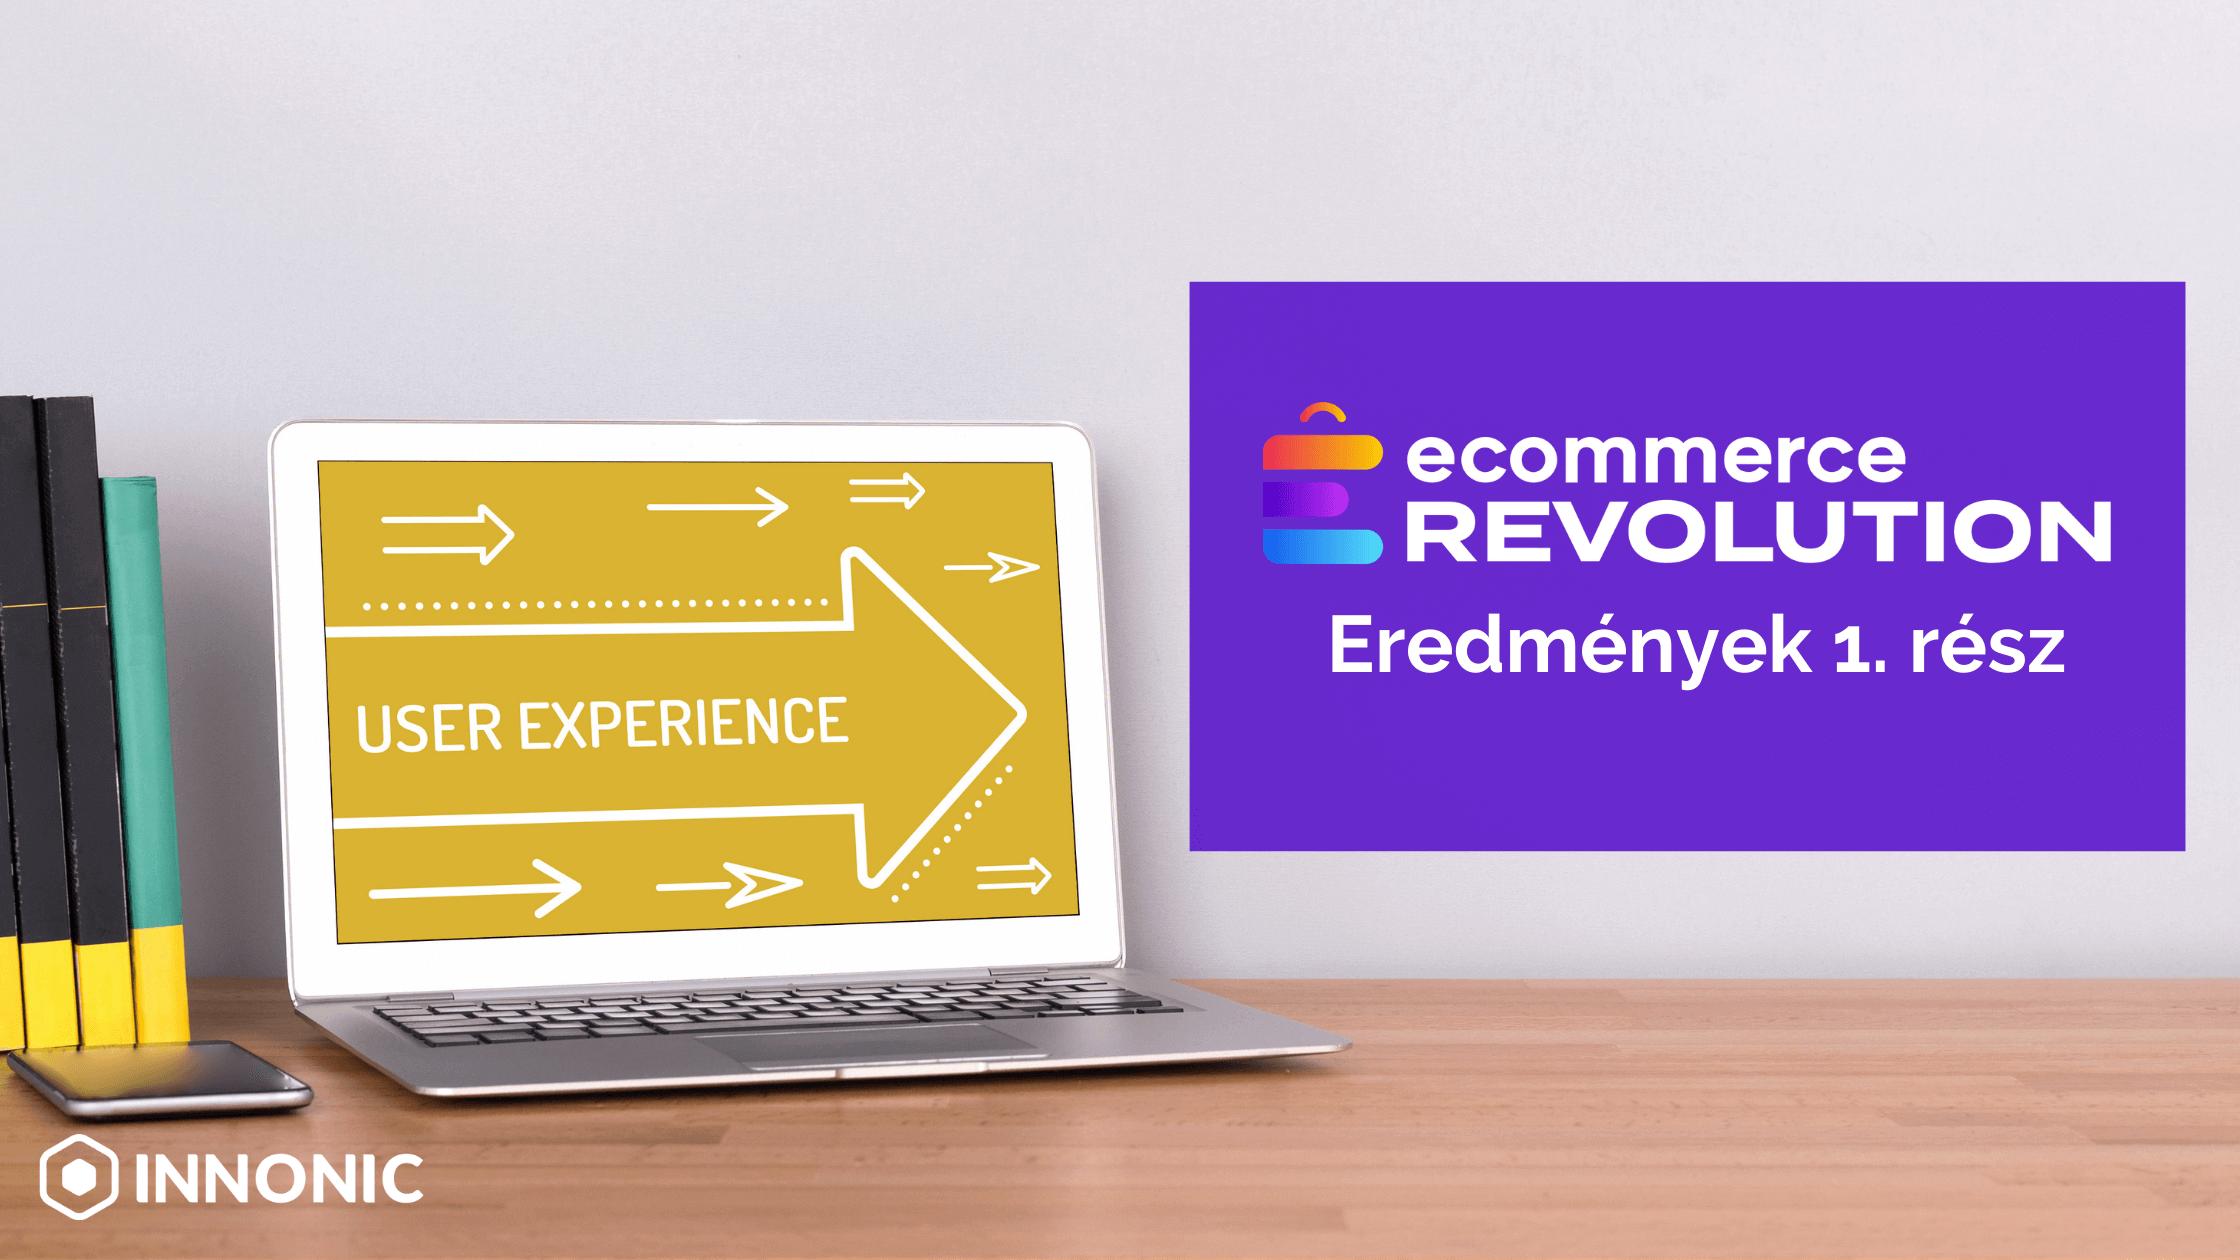 ecommerce revolution (1)